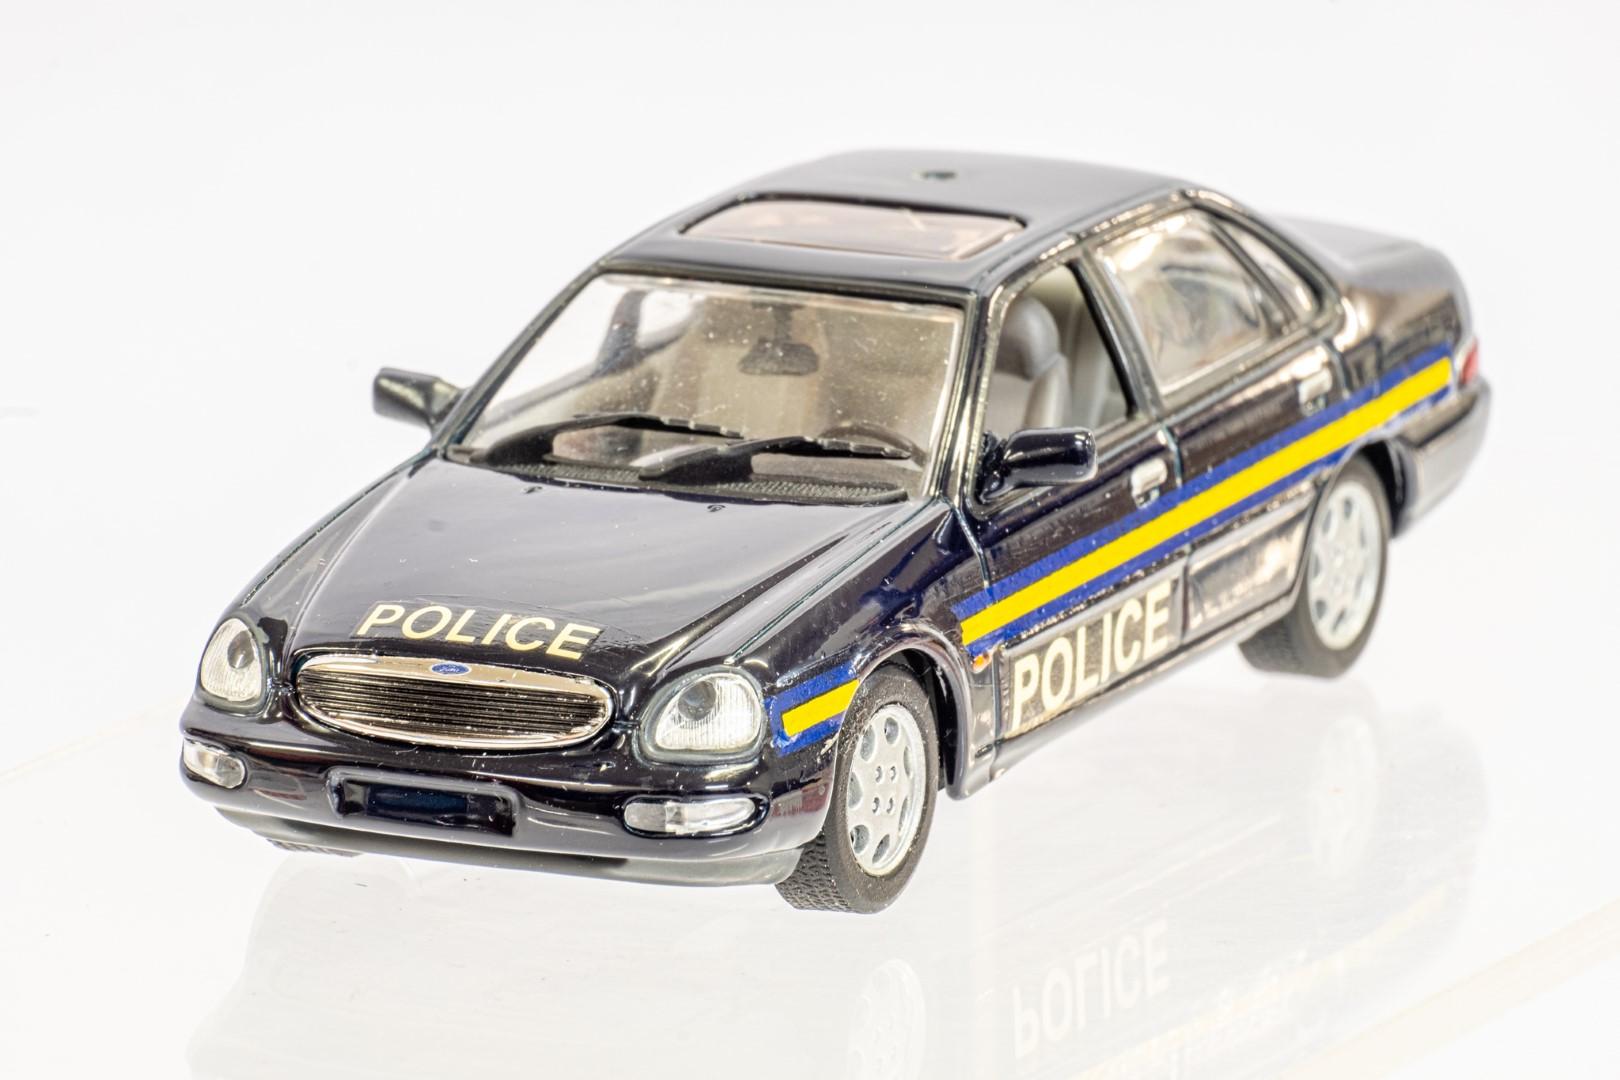 Automax Ford Granada - Police - Code 3 - Image 4 of 7